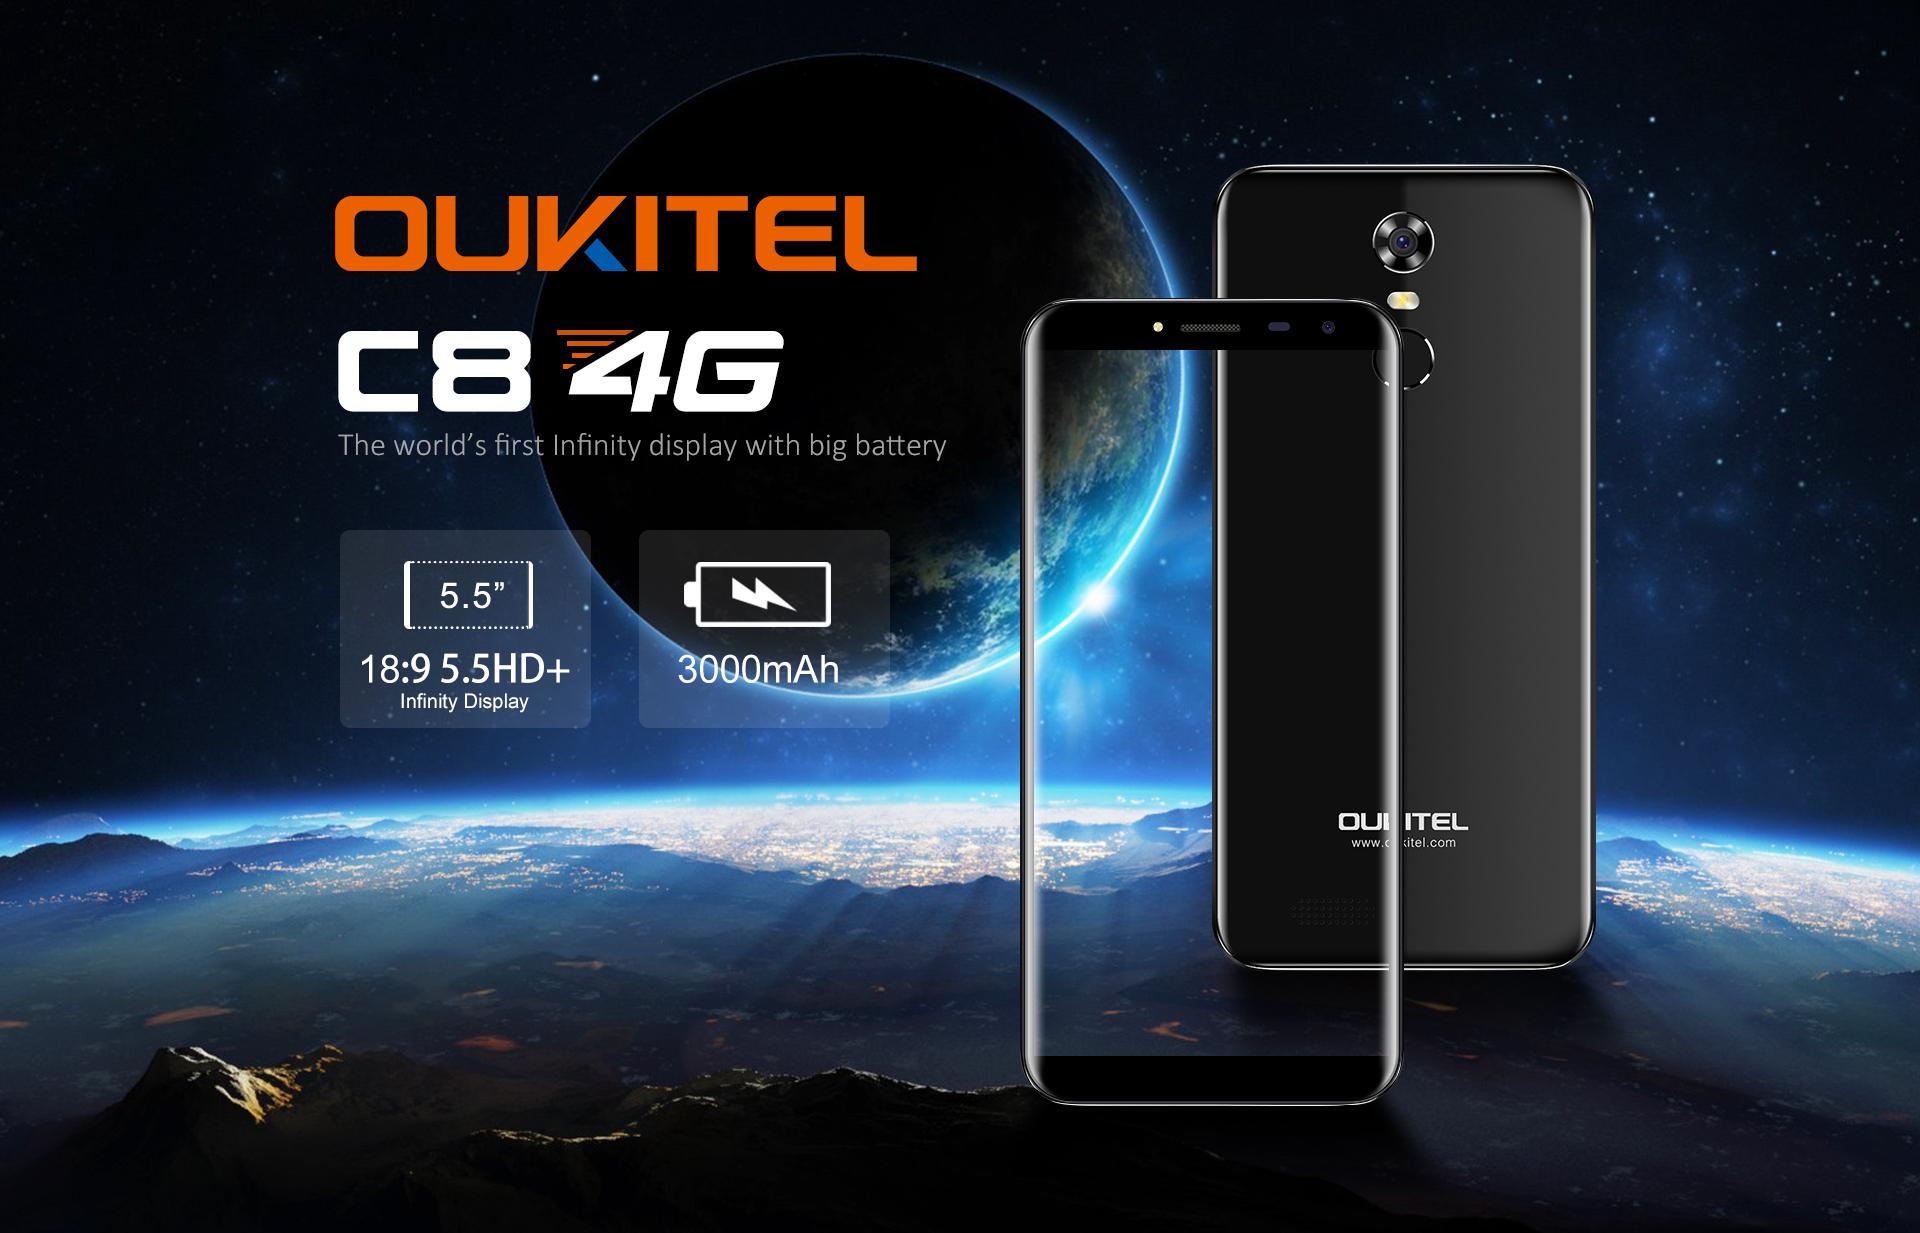 OUKITEL-C8-4G